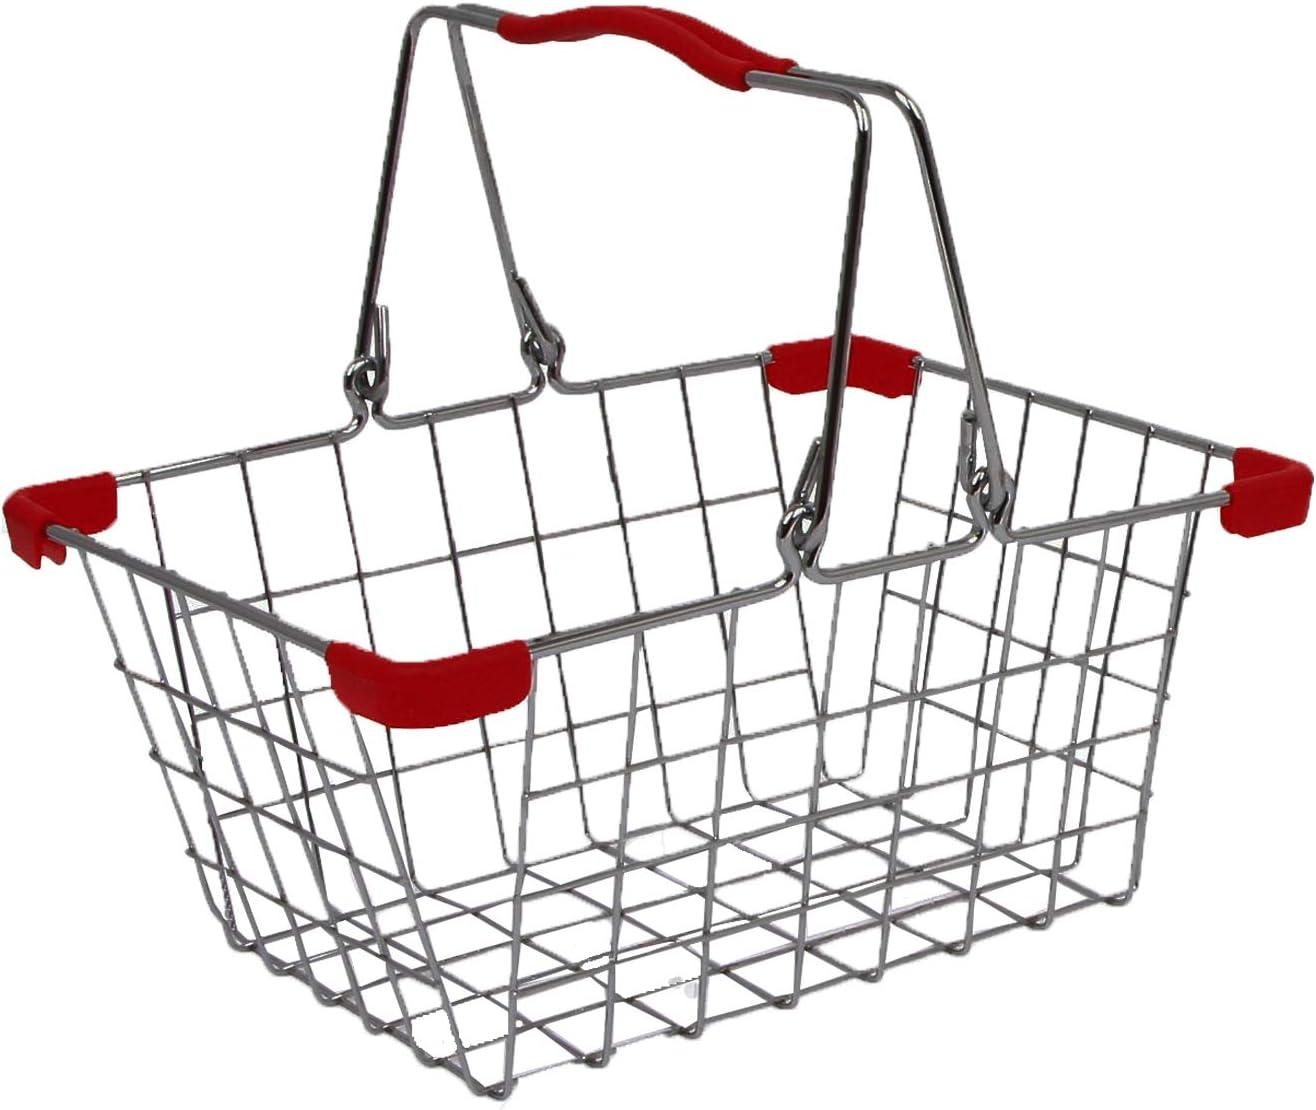 imagine play kids Tanner Shopping Basket Child size metal